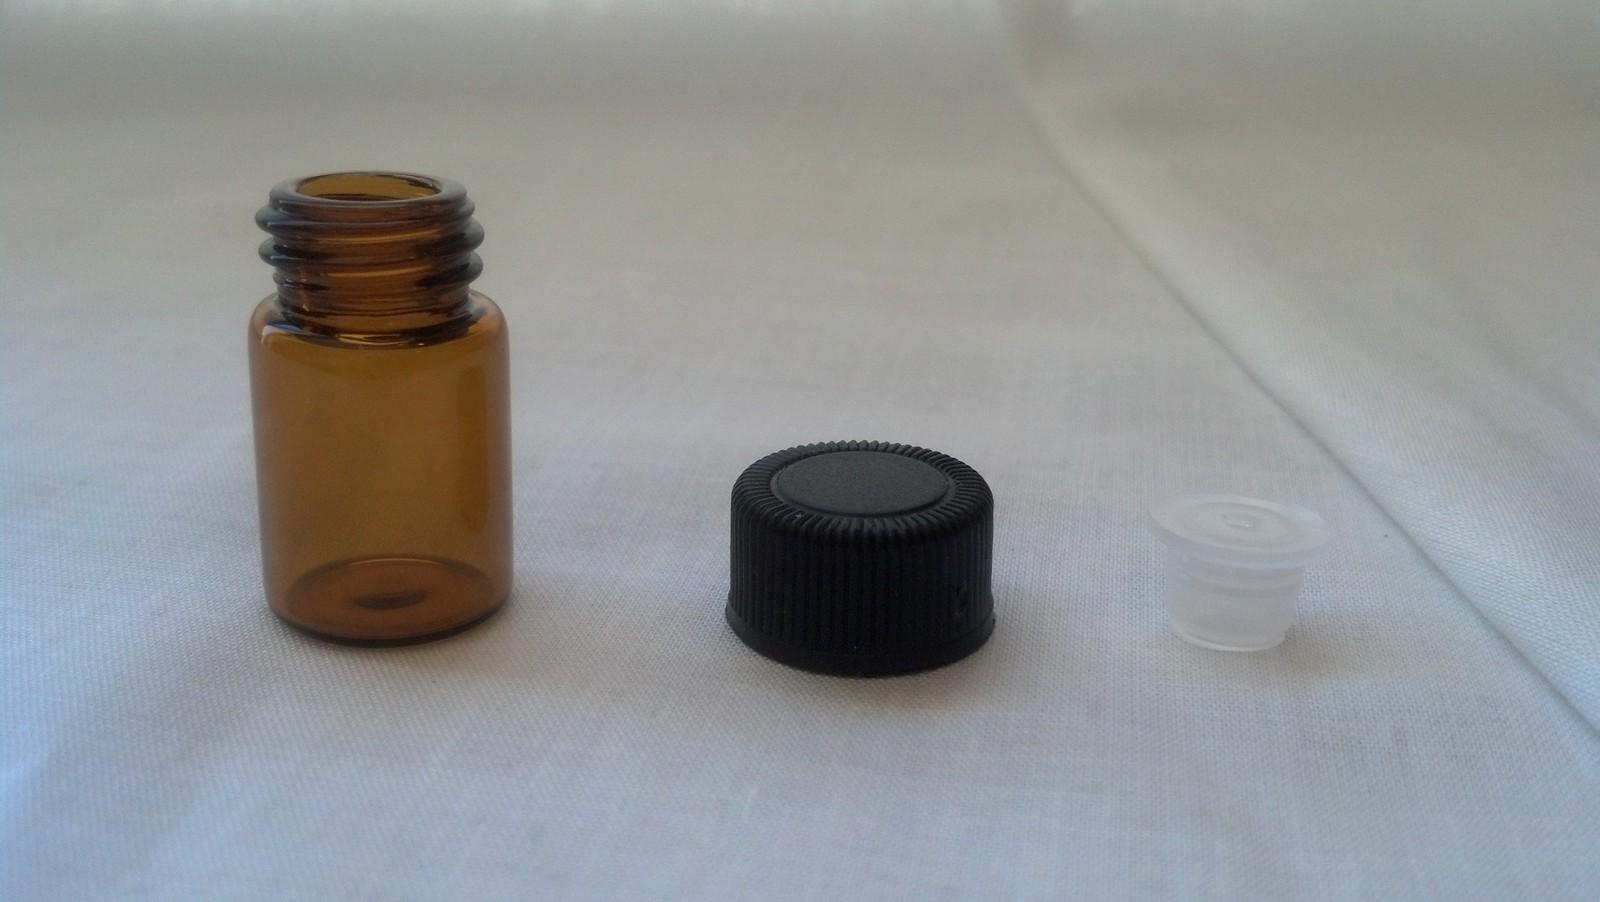 Essential Oil Amber Glass Vials-50 ct- 2ml (5/8 dram) bottles w/Orifice Reducers